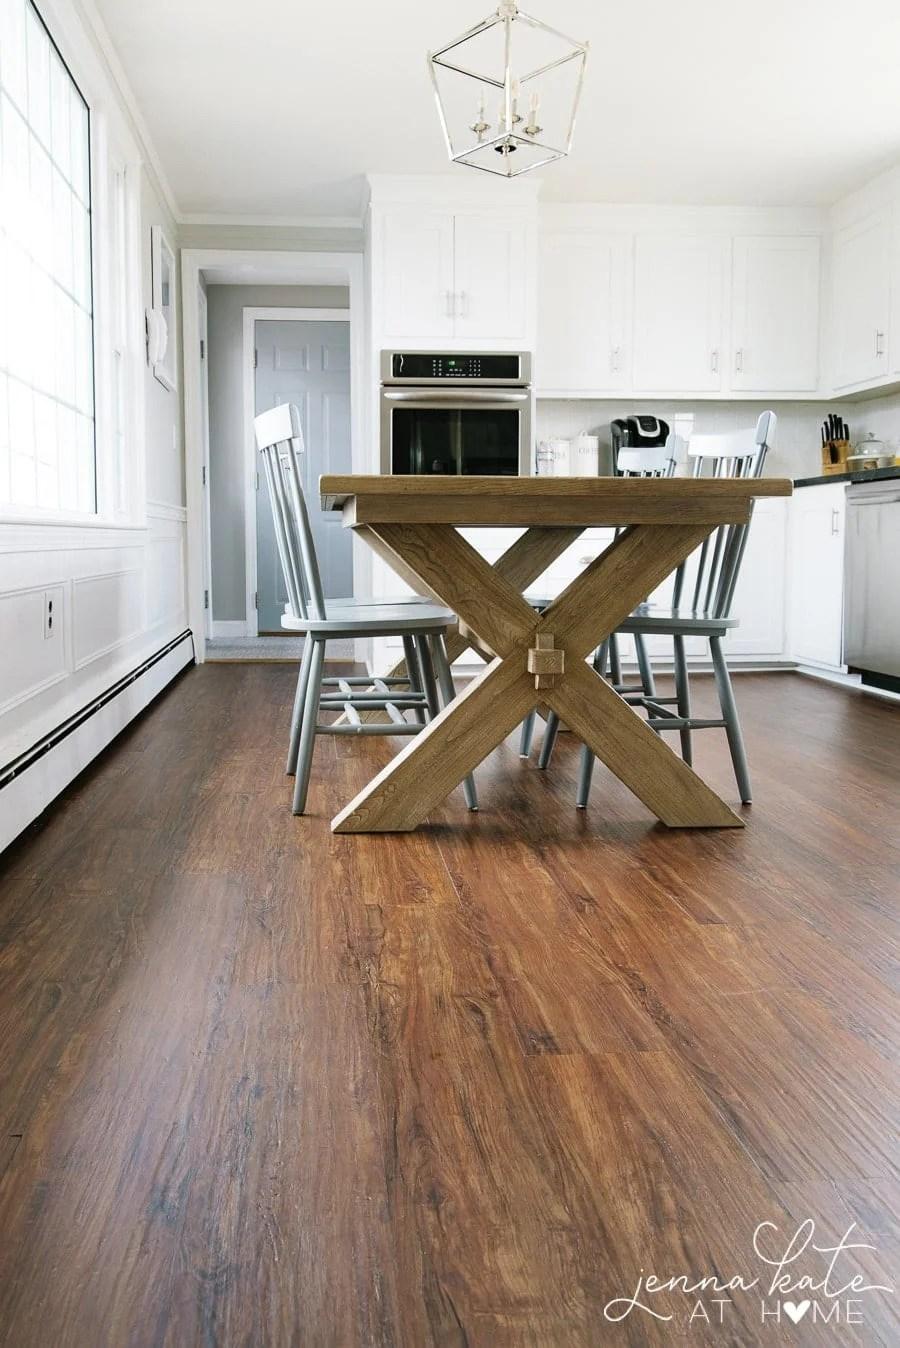 Installing luxury vinyl plank flooring  over existing linoleum floors